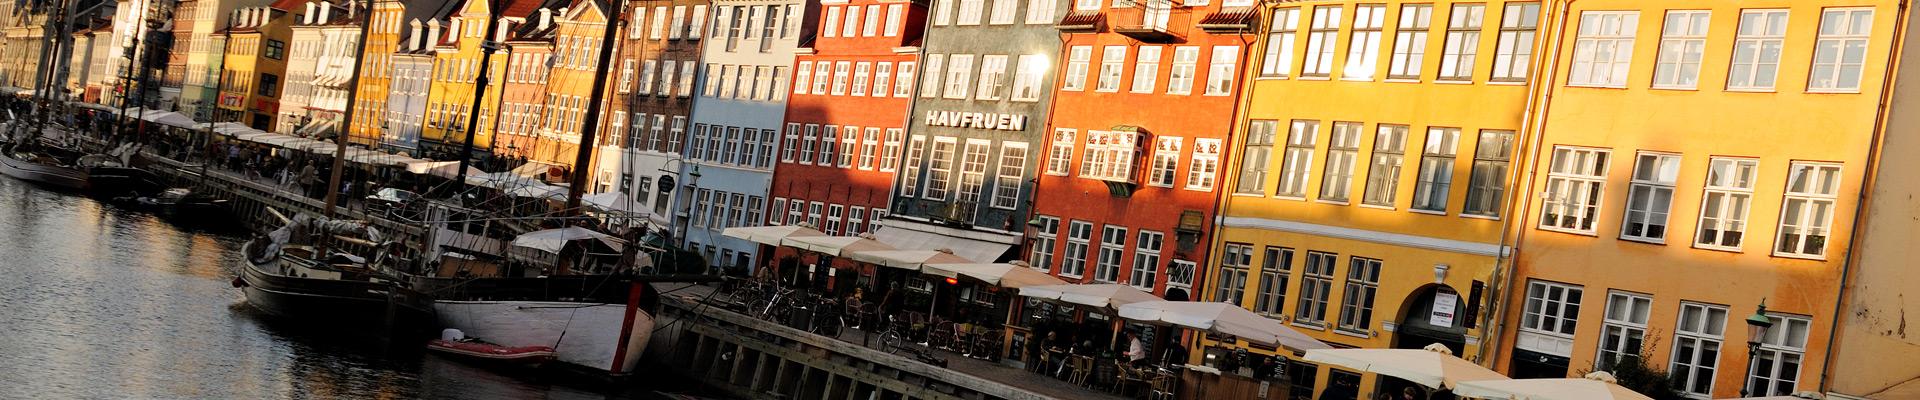 Top image Nyhavn à Copenhague, Danemark